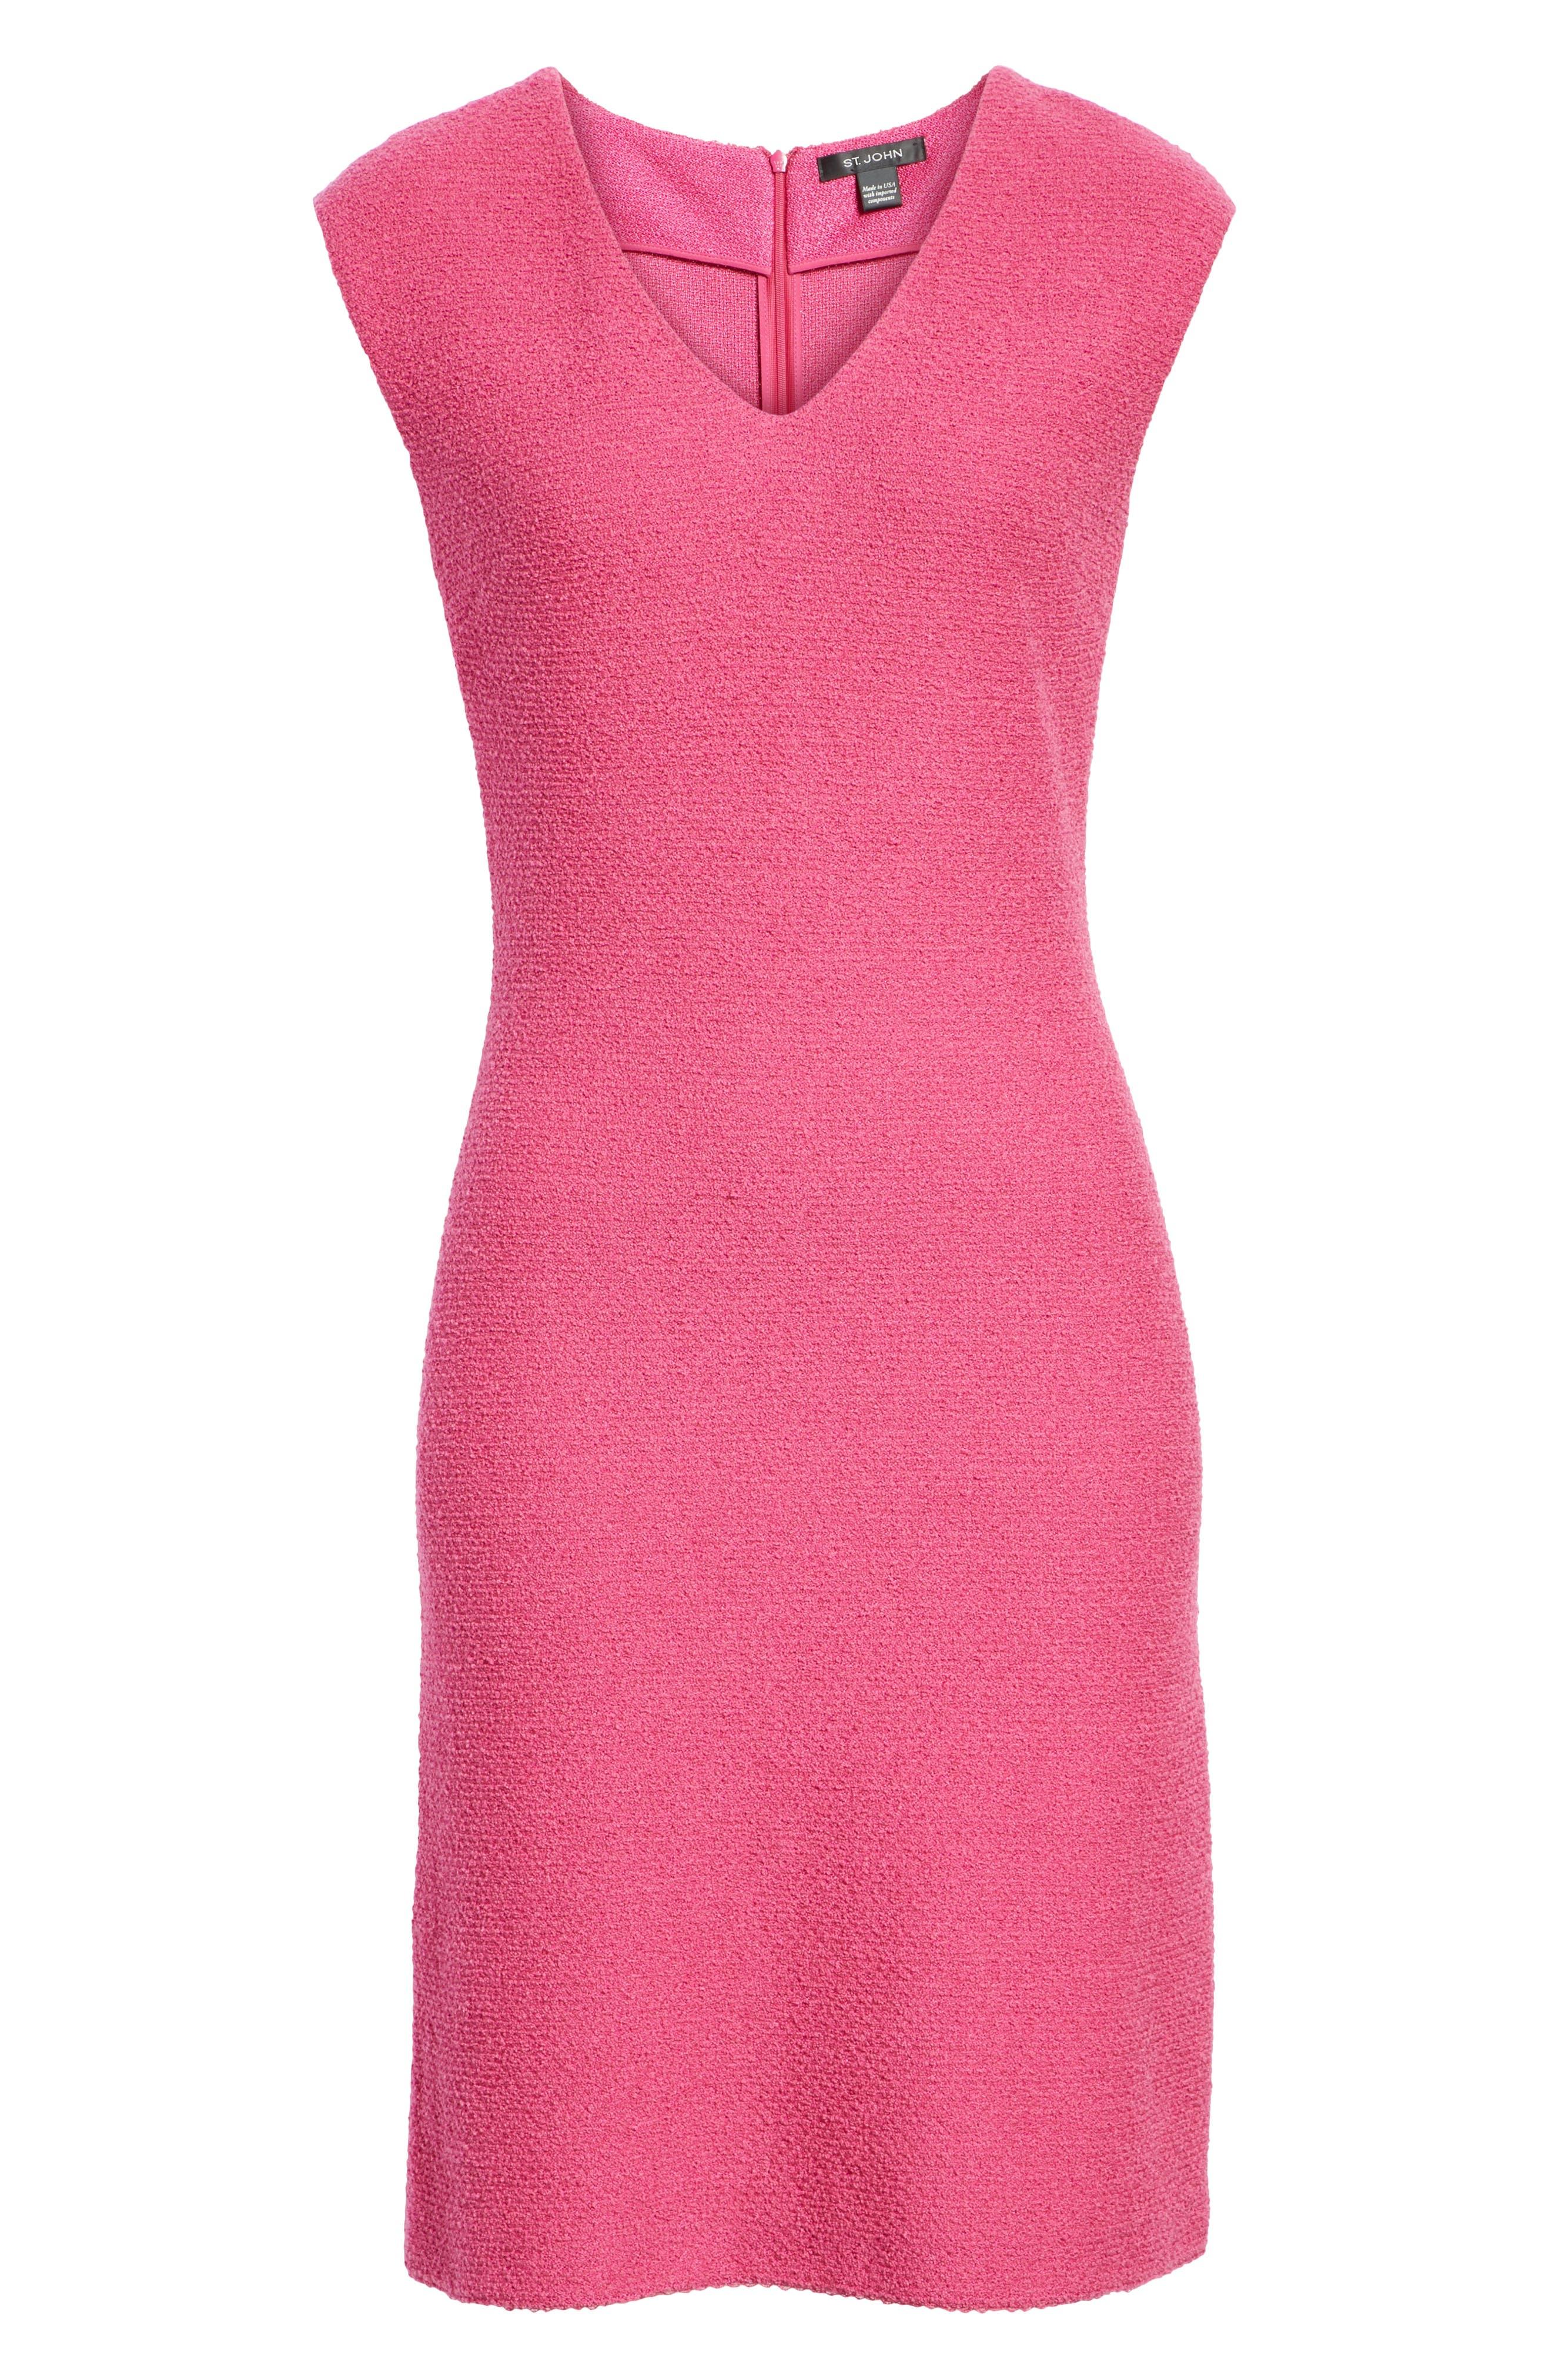 ST. JOHN COLLECTION, Refined Knit Dress, Alternate thumbnail 7, color, CAMELLIA